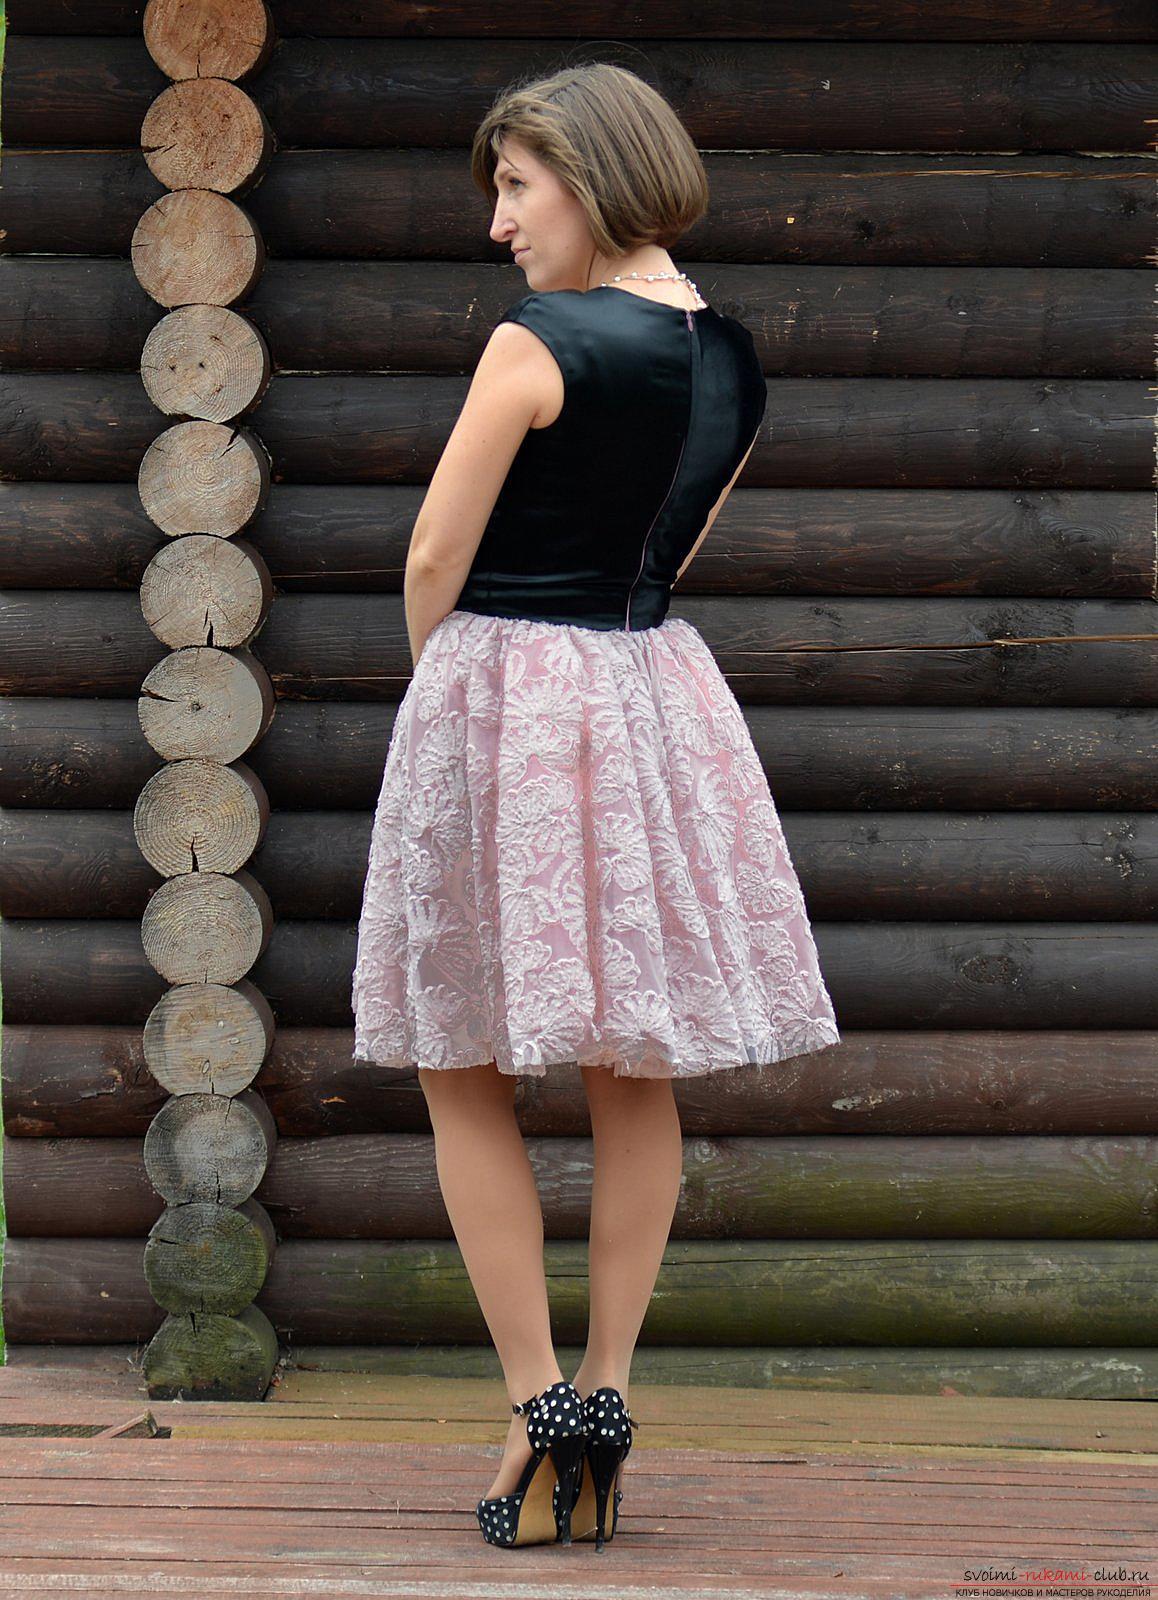 Шитье платья мастер класс фото #10